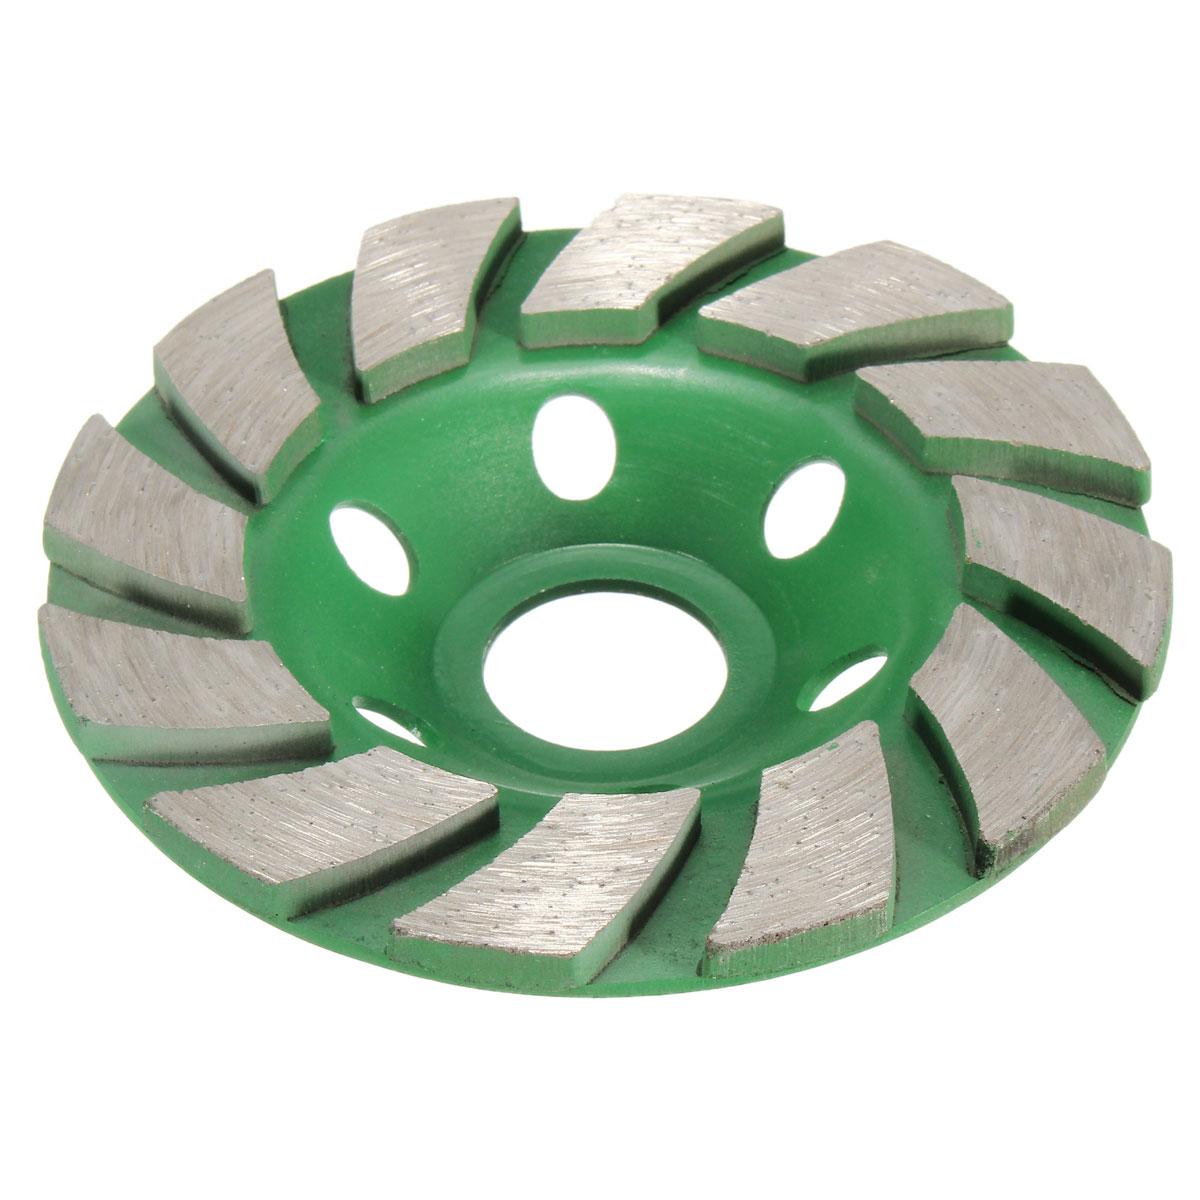 Diamond Grinding Concrete Cup Wheel Disc Concrete Masonry